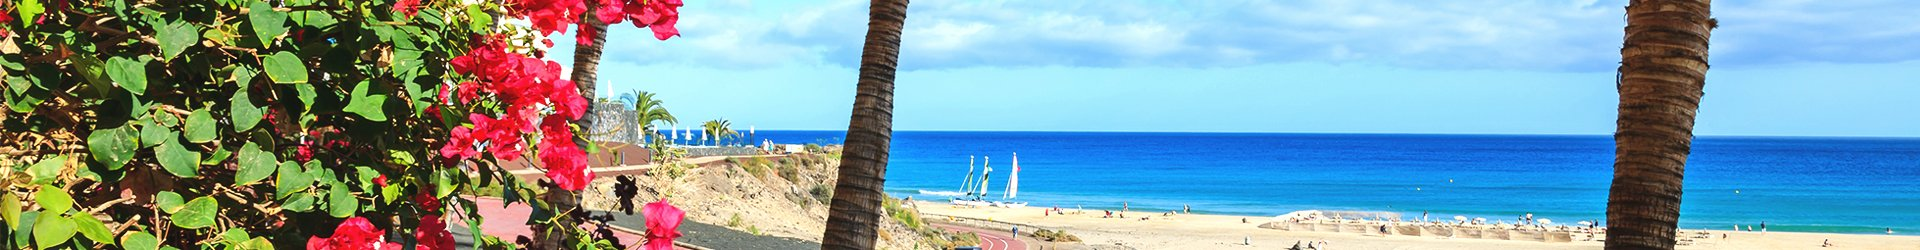 Tenerife, Spanje